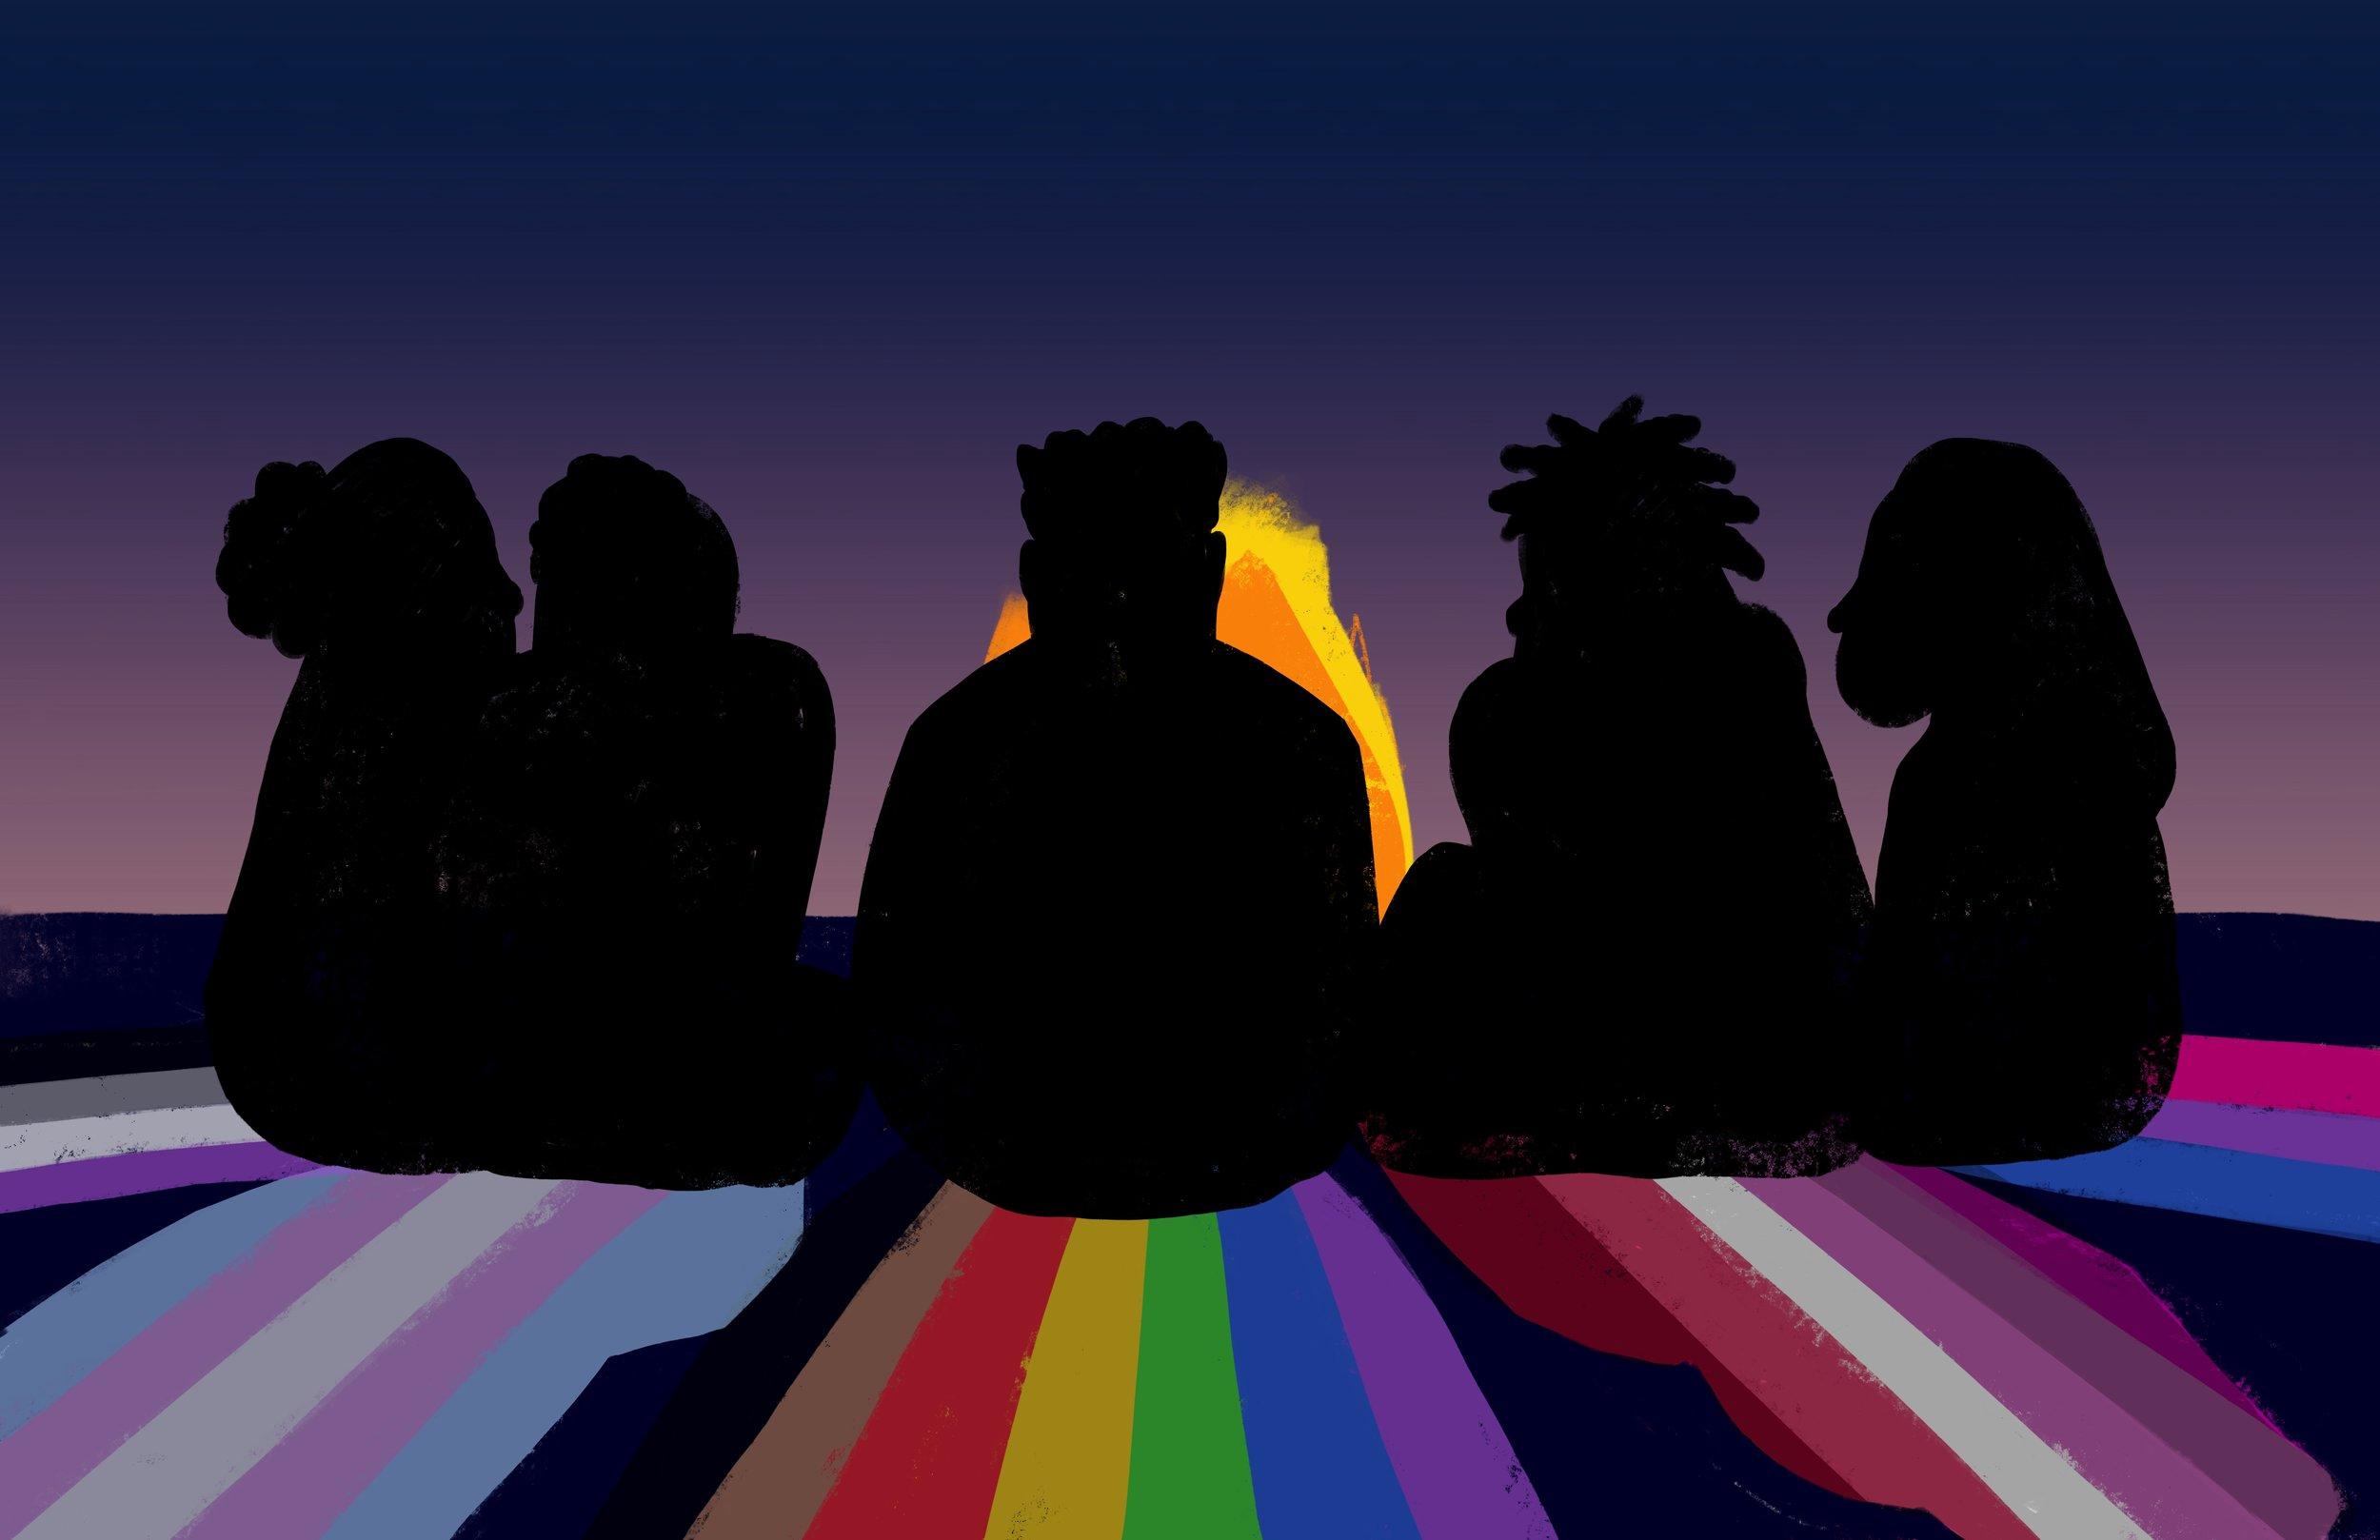 ColorBloq-ColorBloc-Queer-Trans-PeopleOfColor-Ccorellana-Muse.jpg